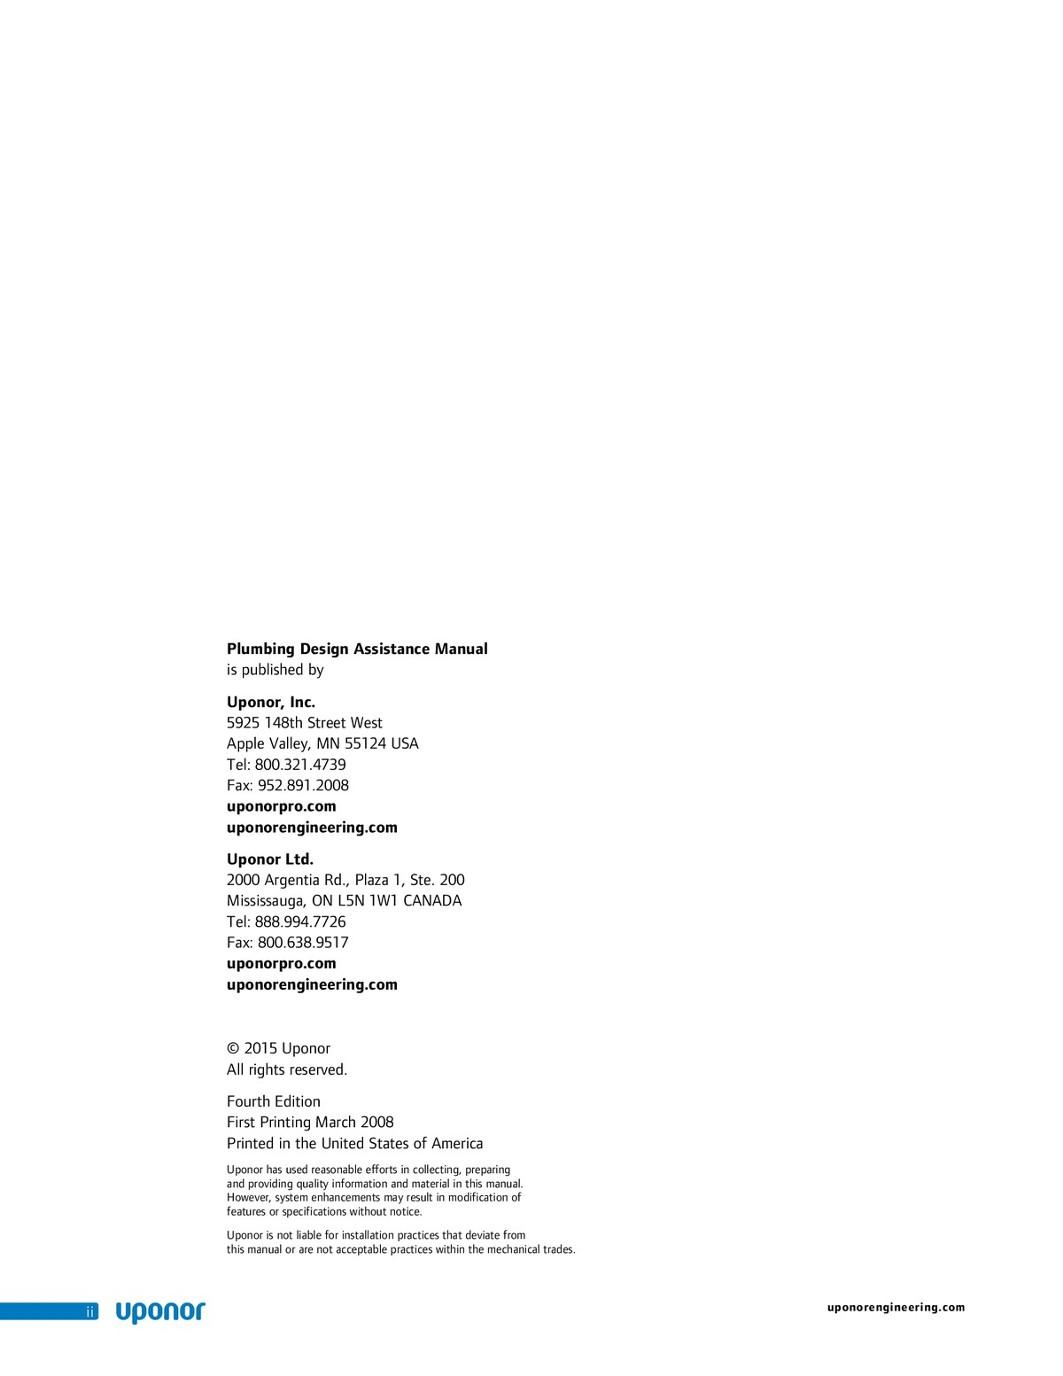 PDAM_Manual_68674_1215_LR